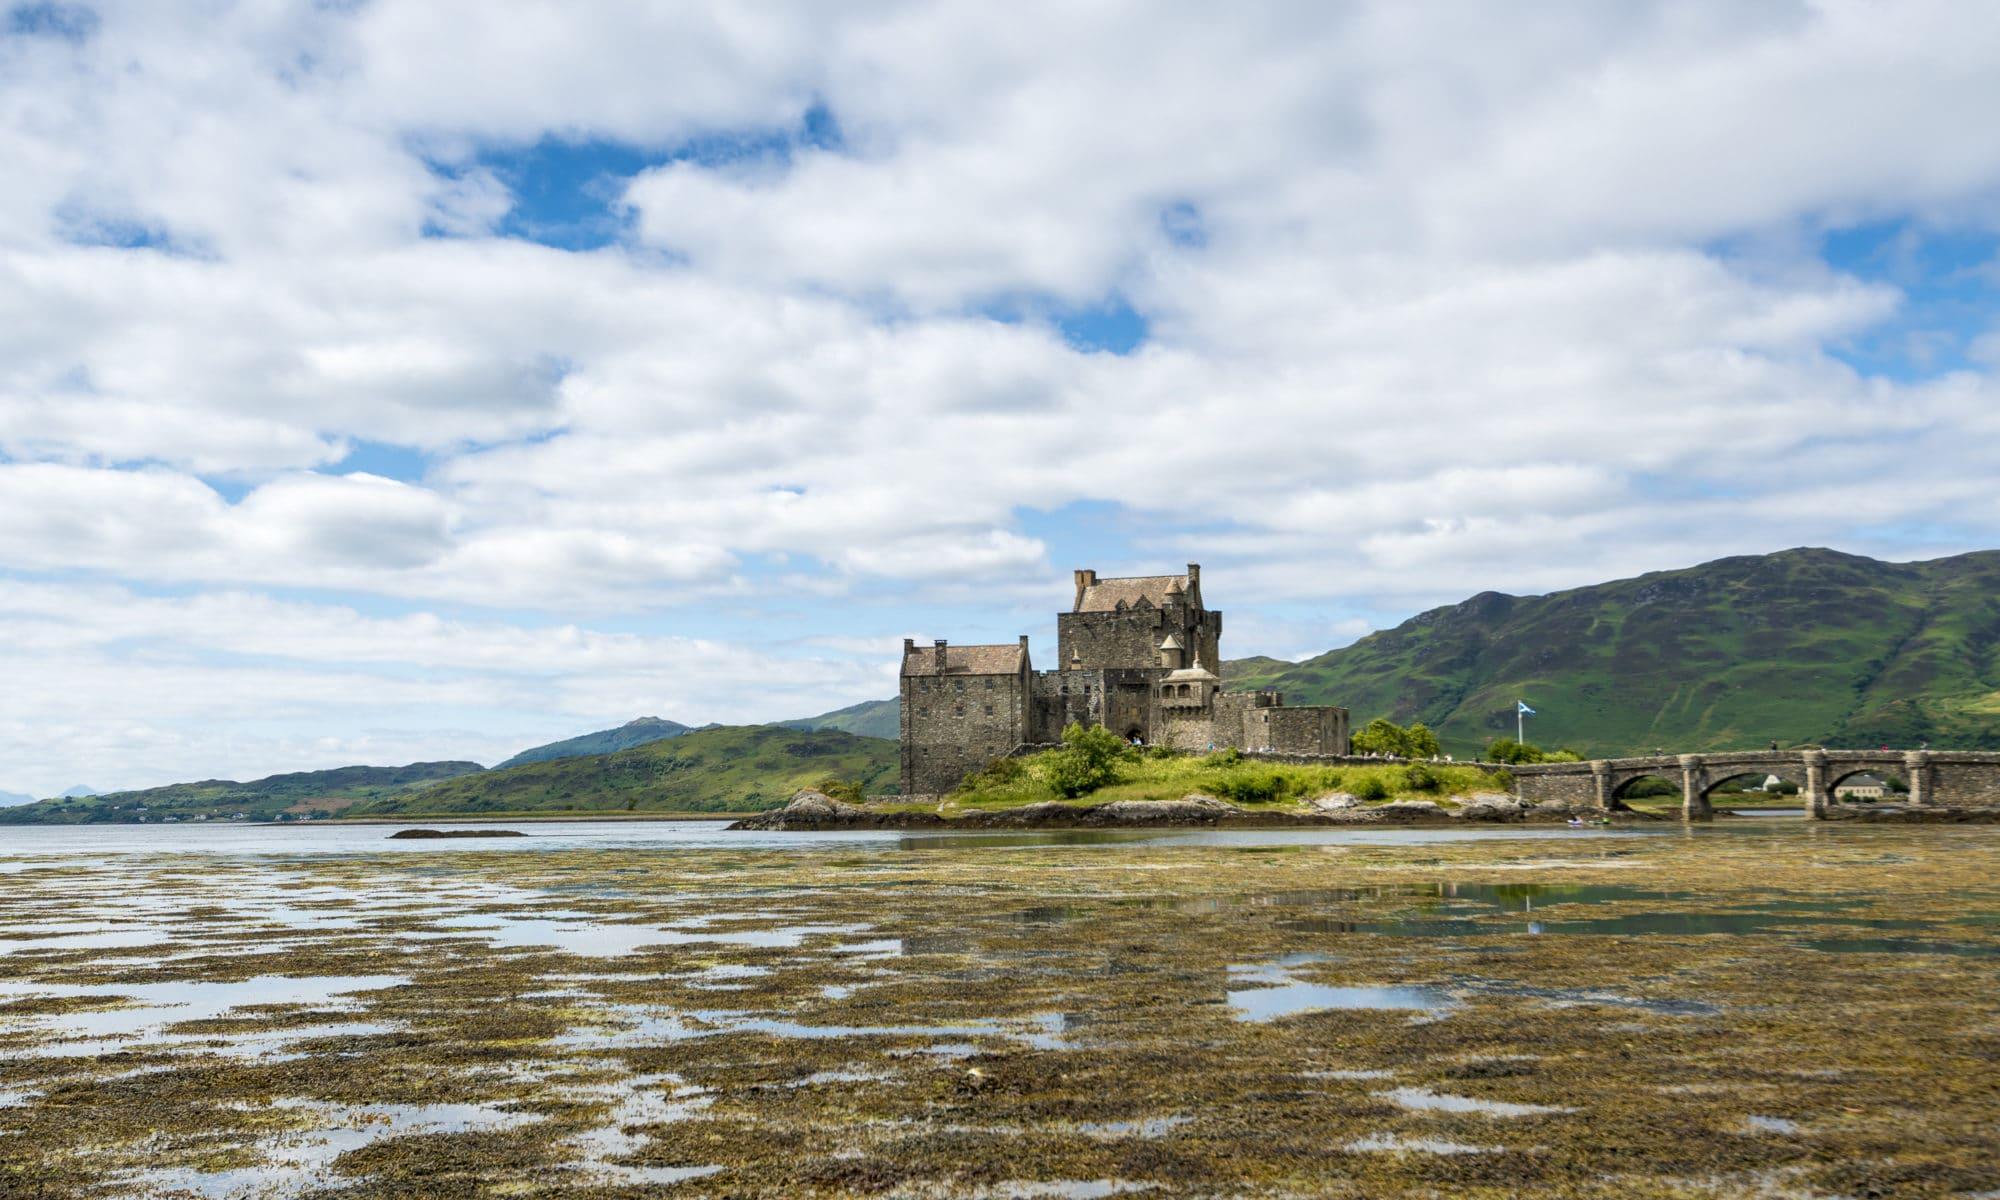 Uen visite à Eilean Donan Castle Roadtrip Sir Edward's